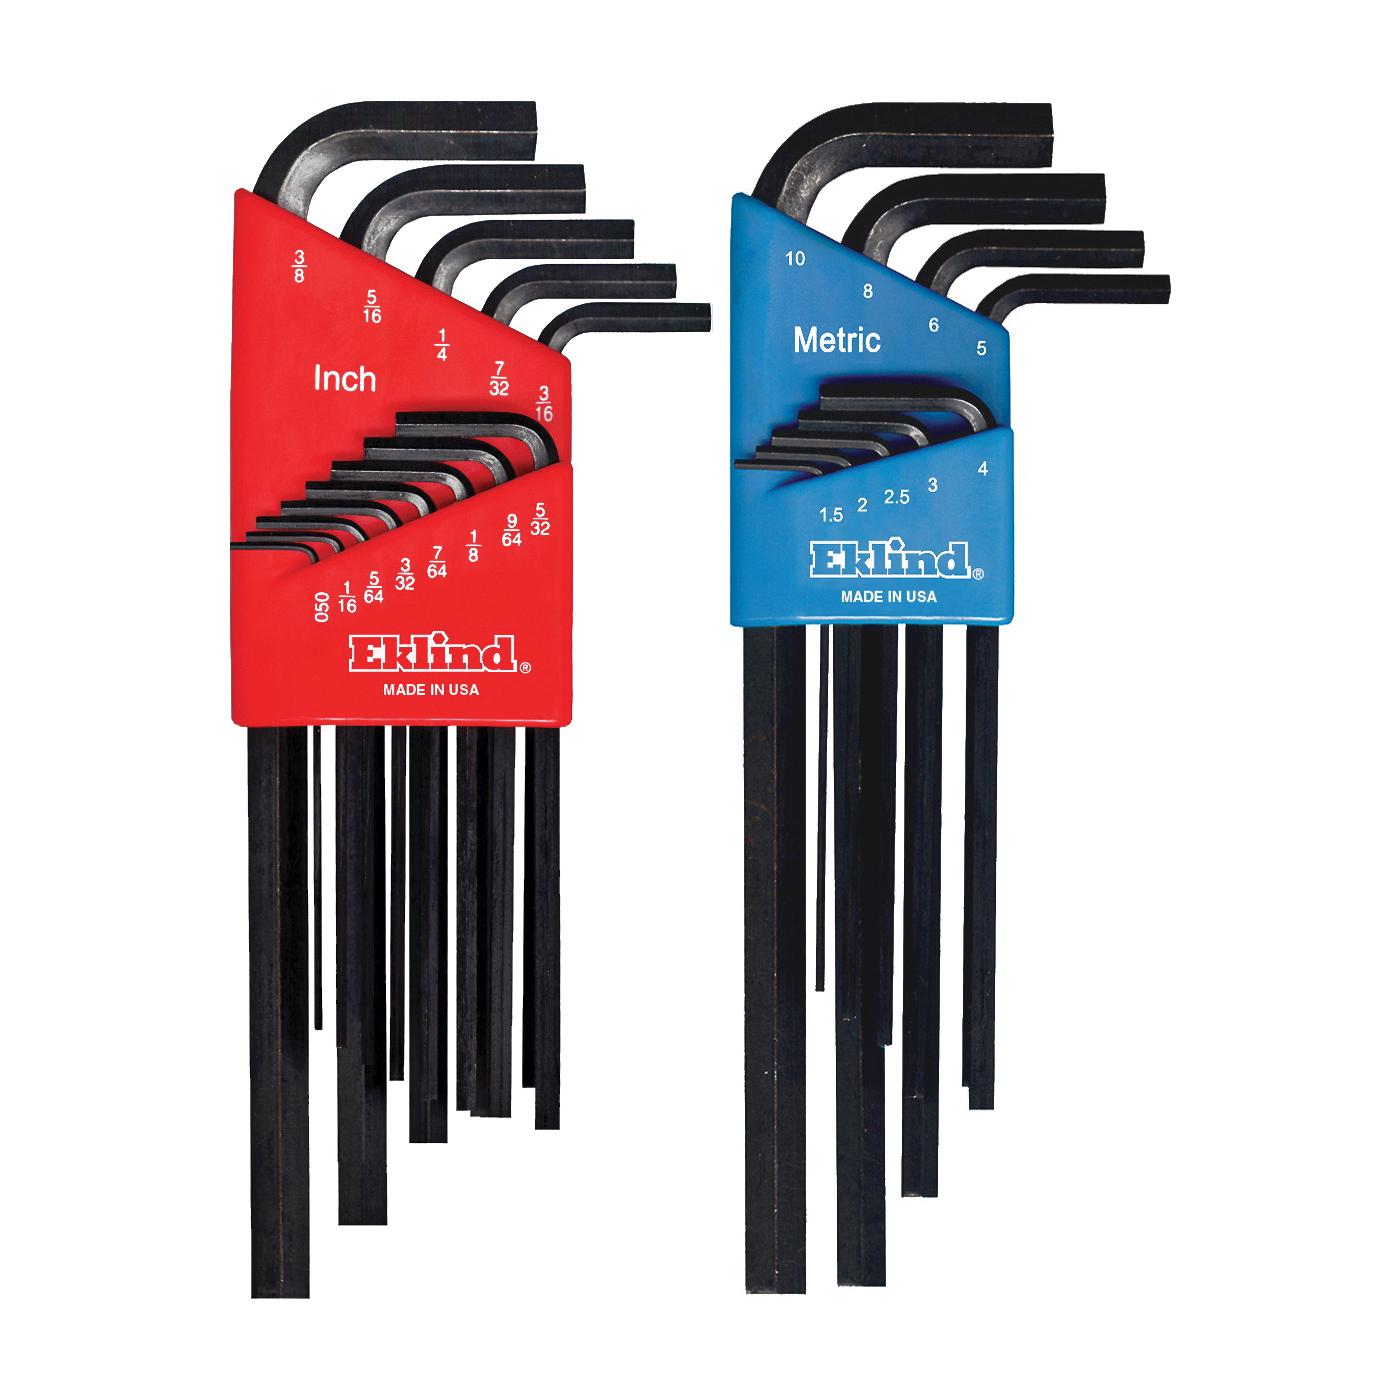 Eklind® 10213 Hex-L® Long Key Set, 13 Pieces, 0.05 to 0.375 in Hex, L-Handle Handle, ANSI B18.3, Alloy Steel, Black Oxide